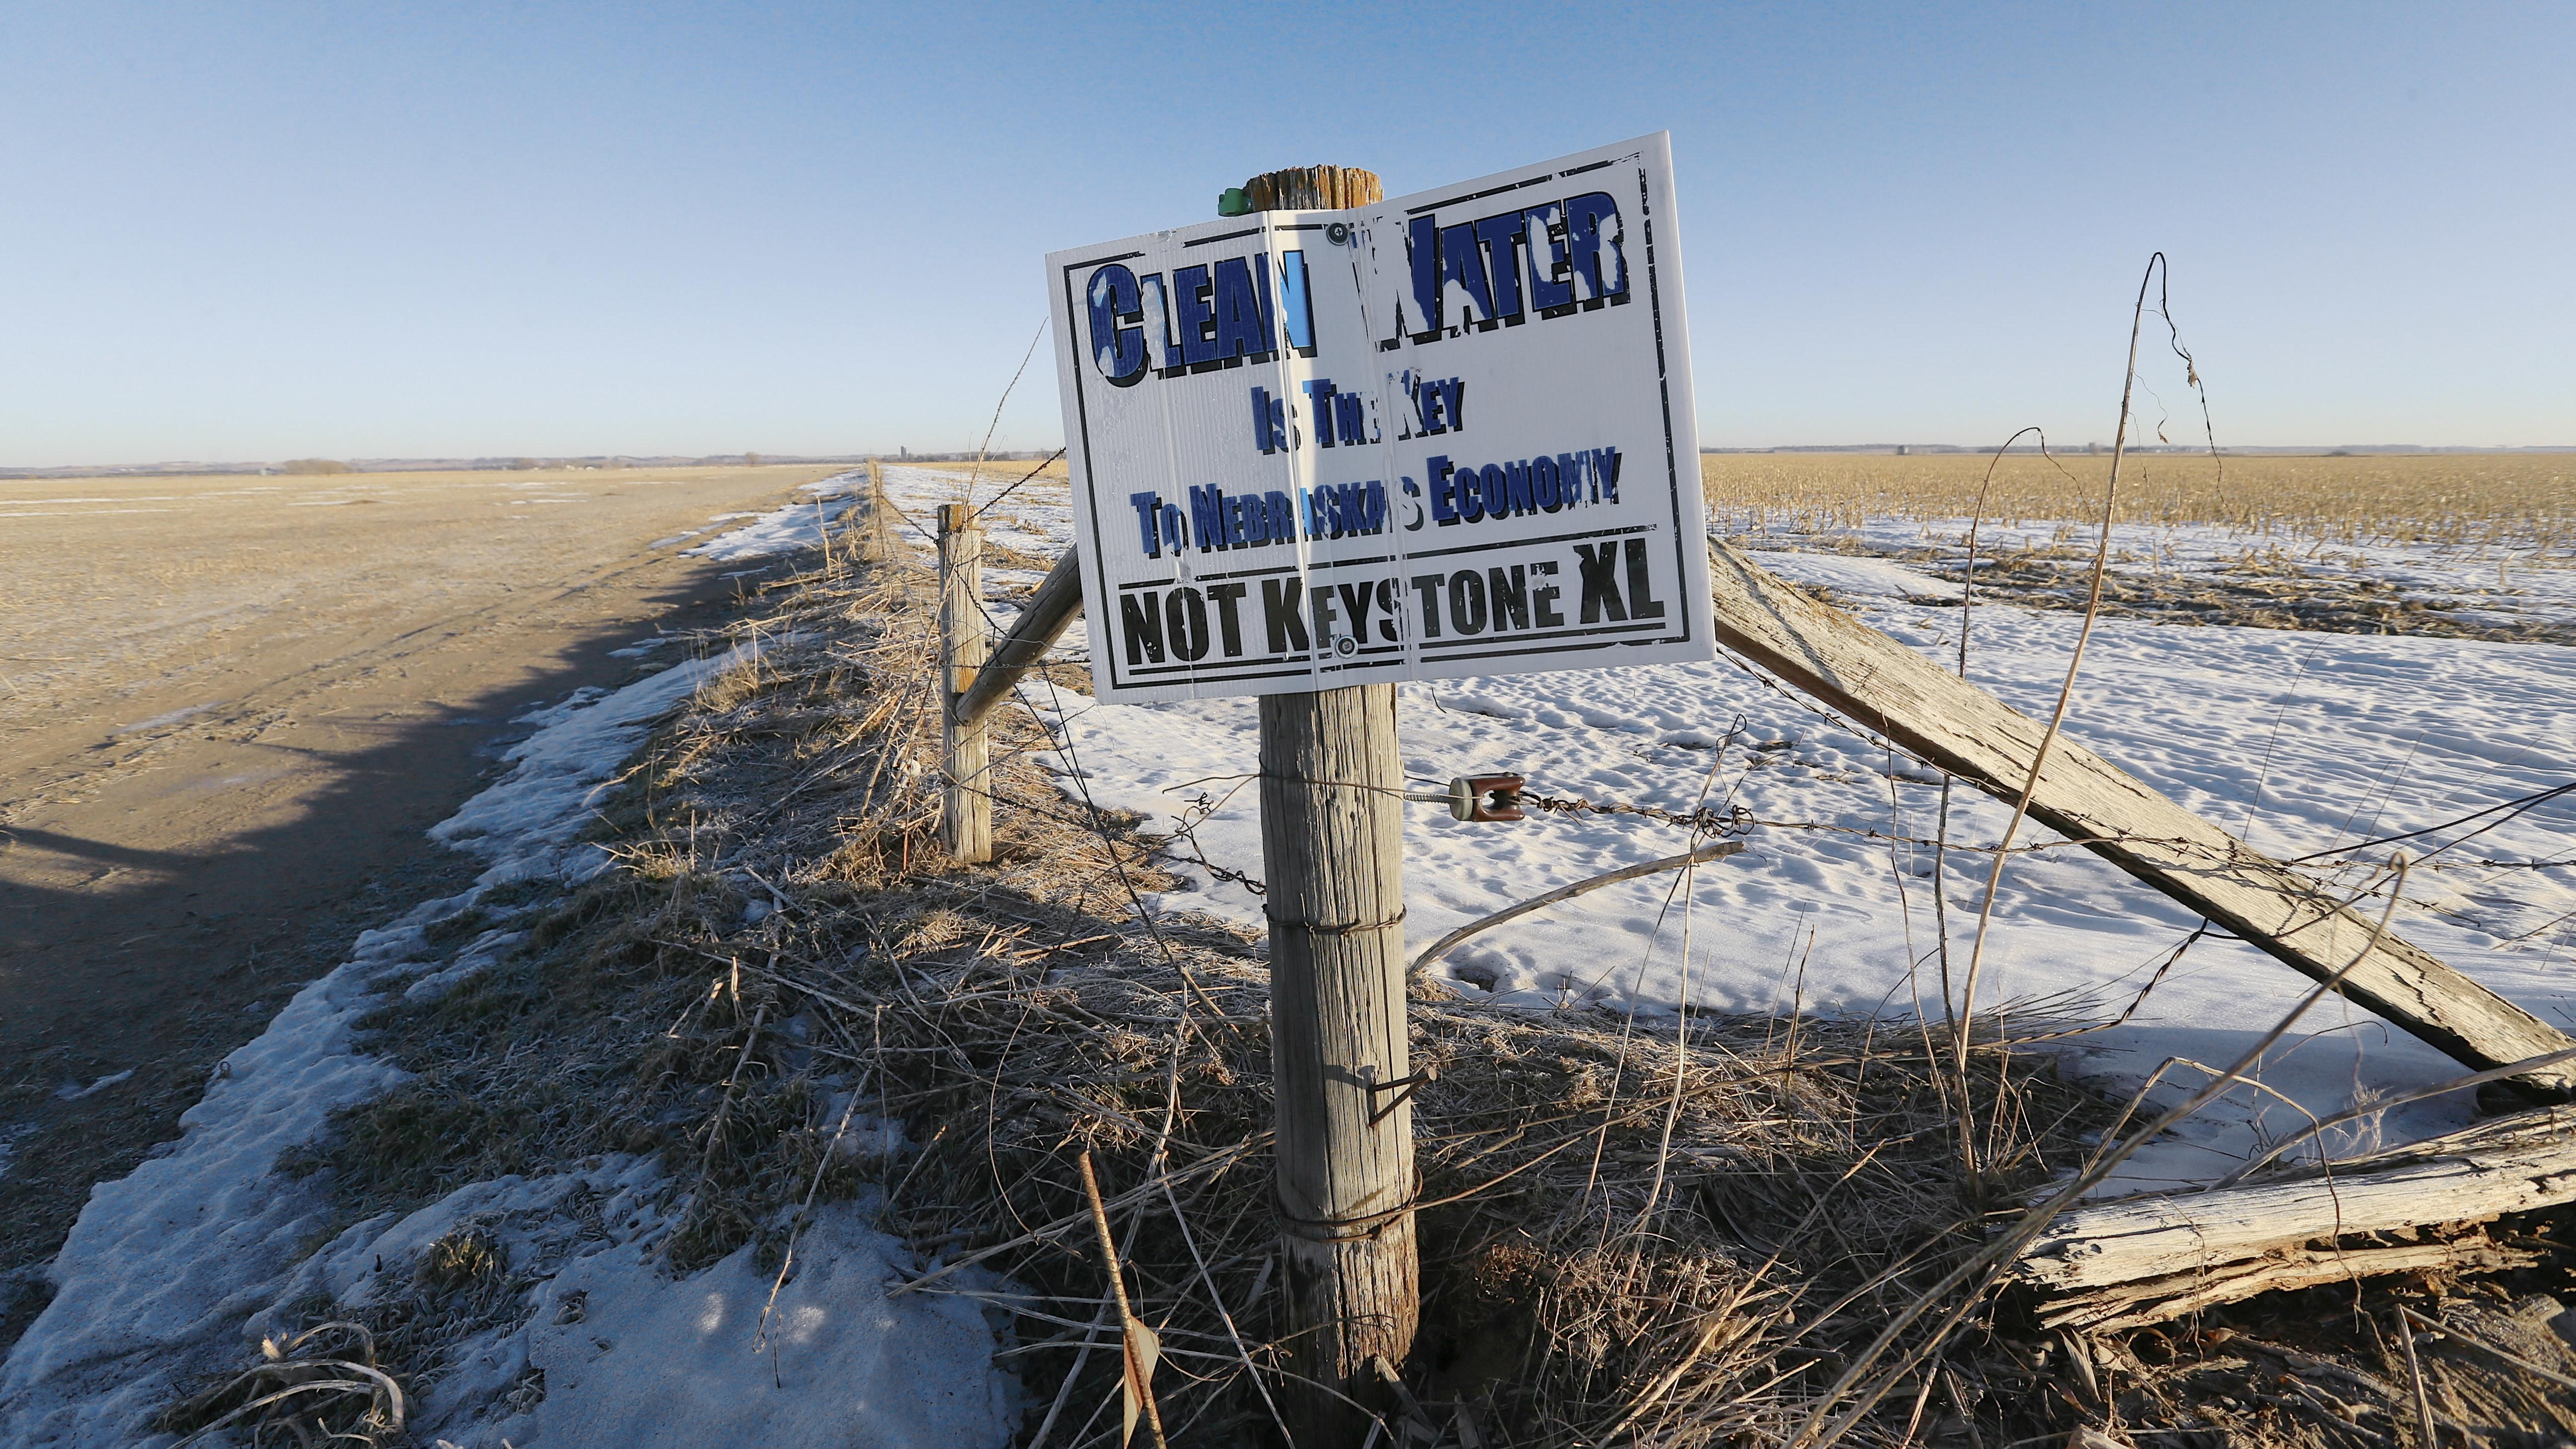 Keystone Pipeline's Alternate Route Gets The Go-Ahead From Nebraska Court